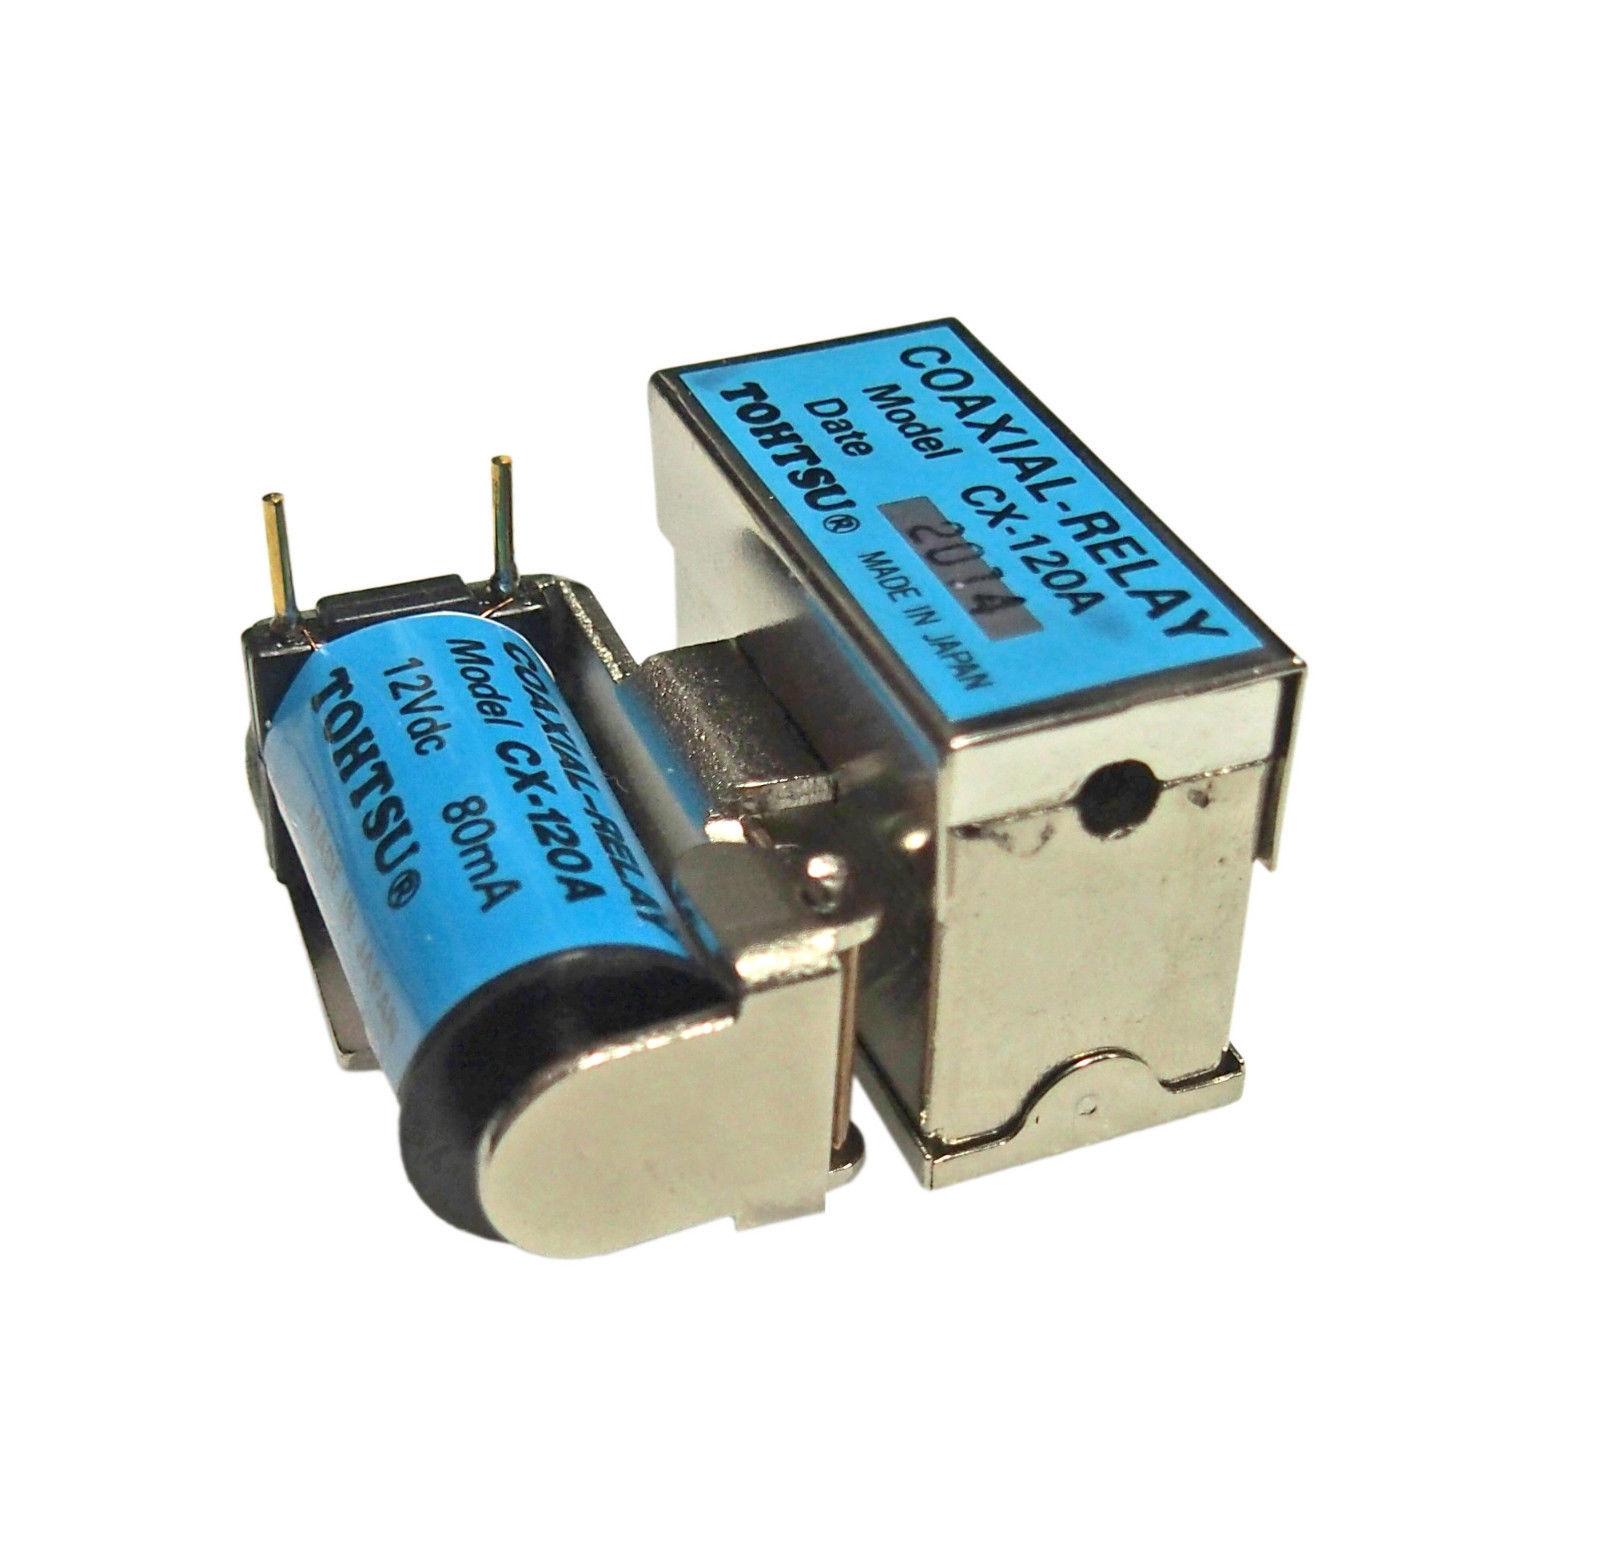 Tohtsu CX-120A coaxial relay